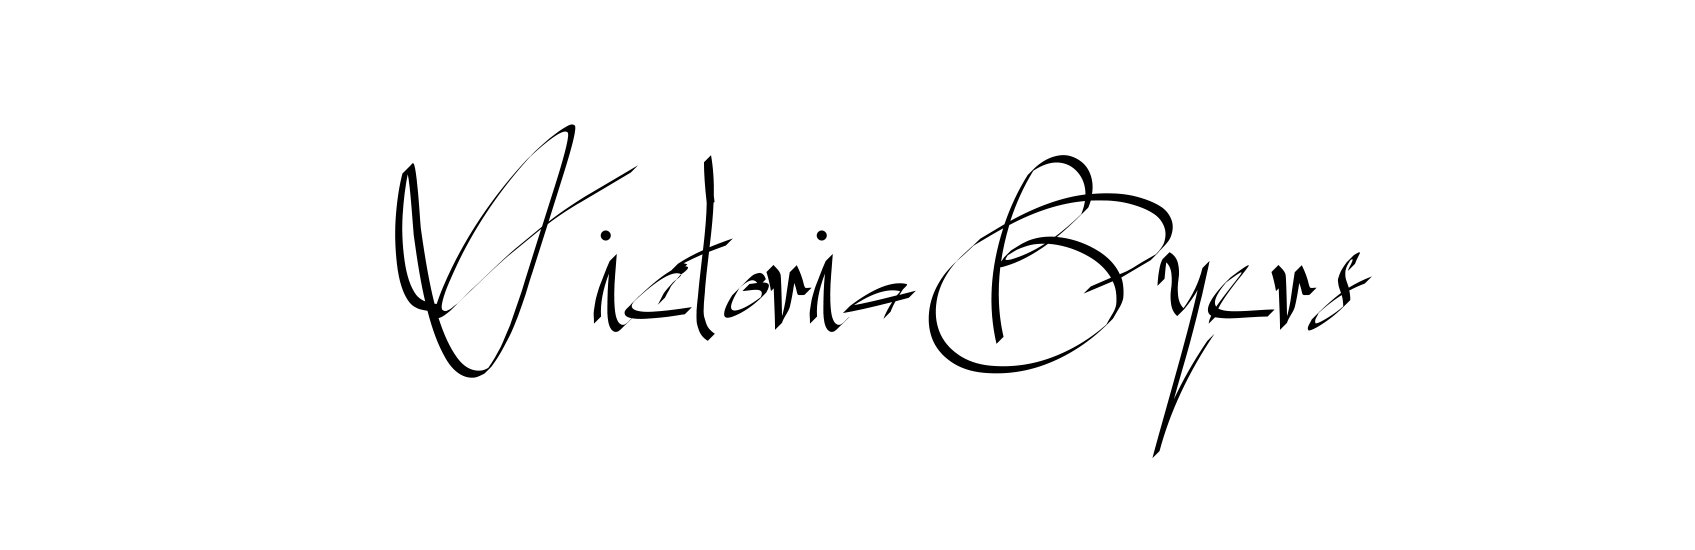 Victoria Byers's Signature